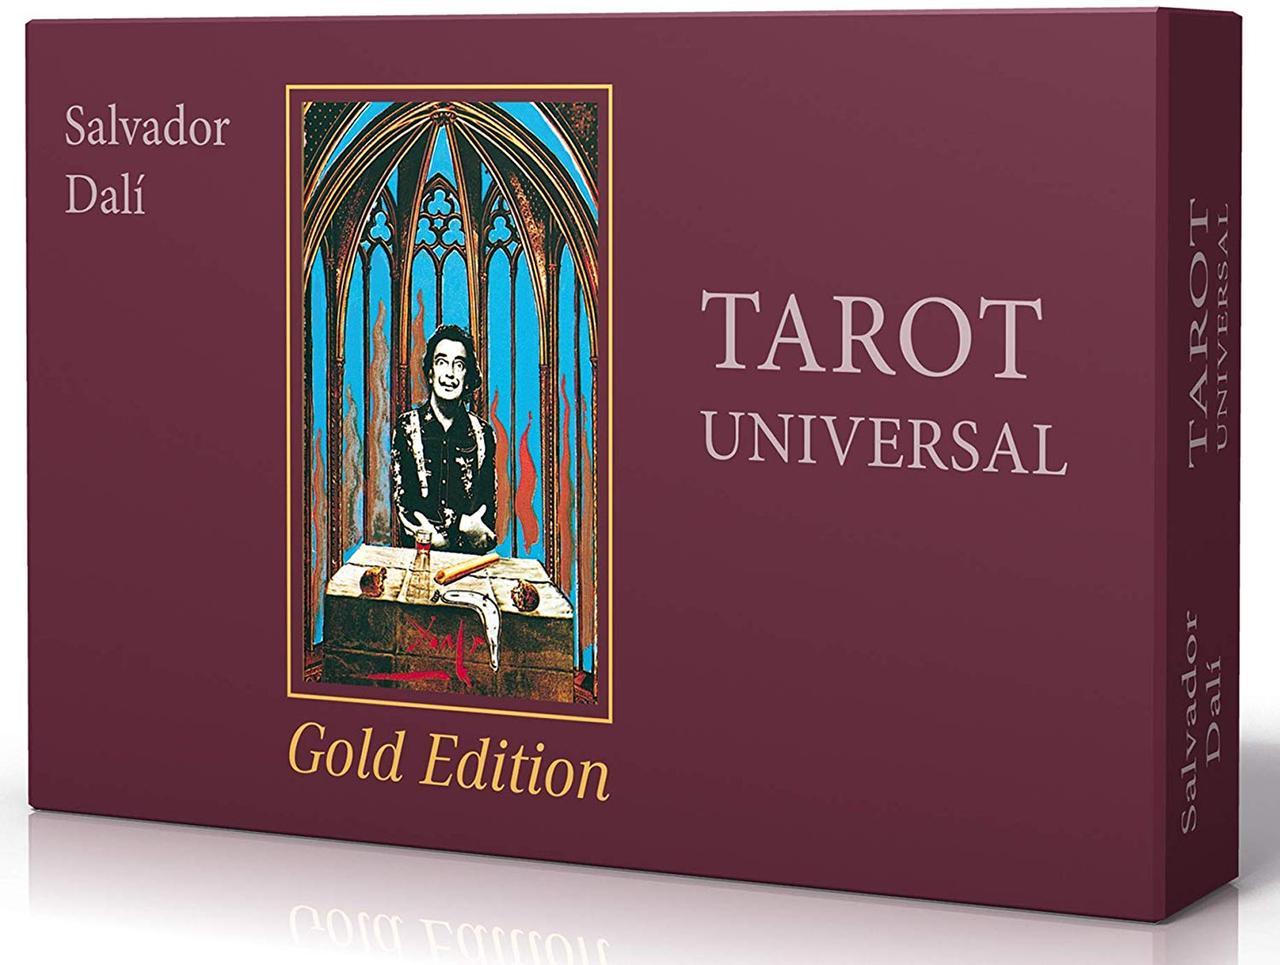 Salvador Dali Tarot Universal - Gold Edition / Таро Сальвадора Дали - Золотая Версия